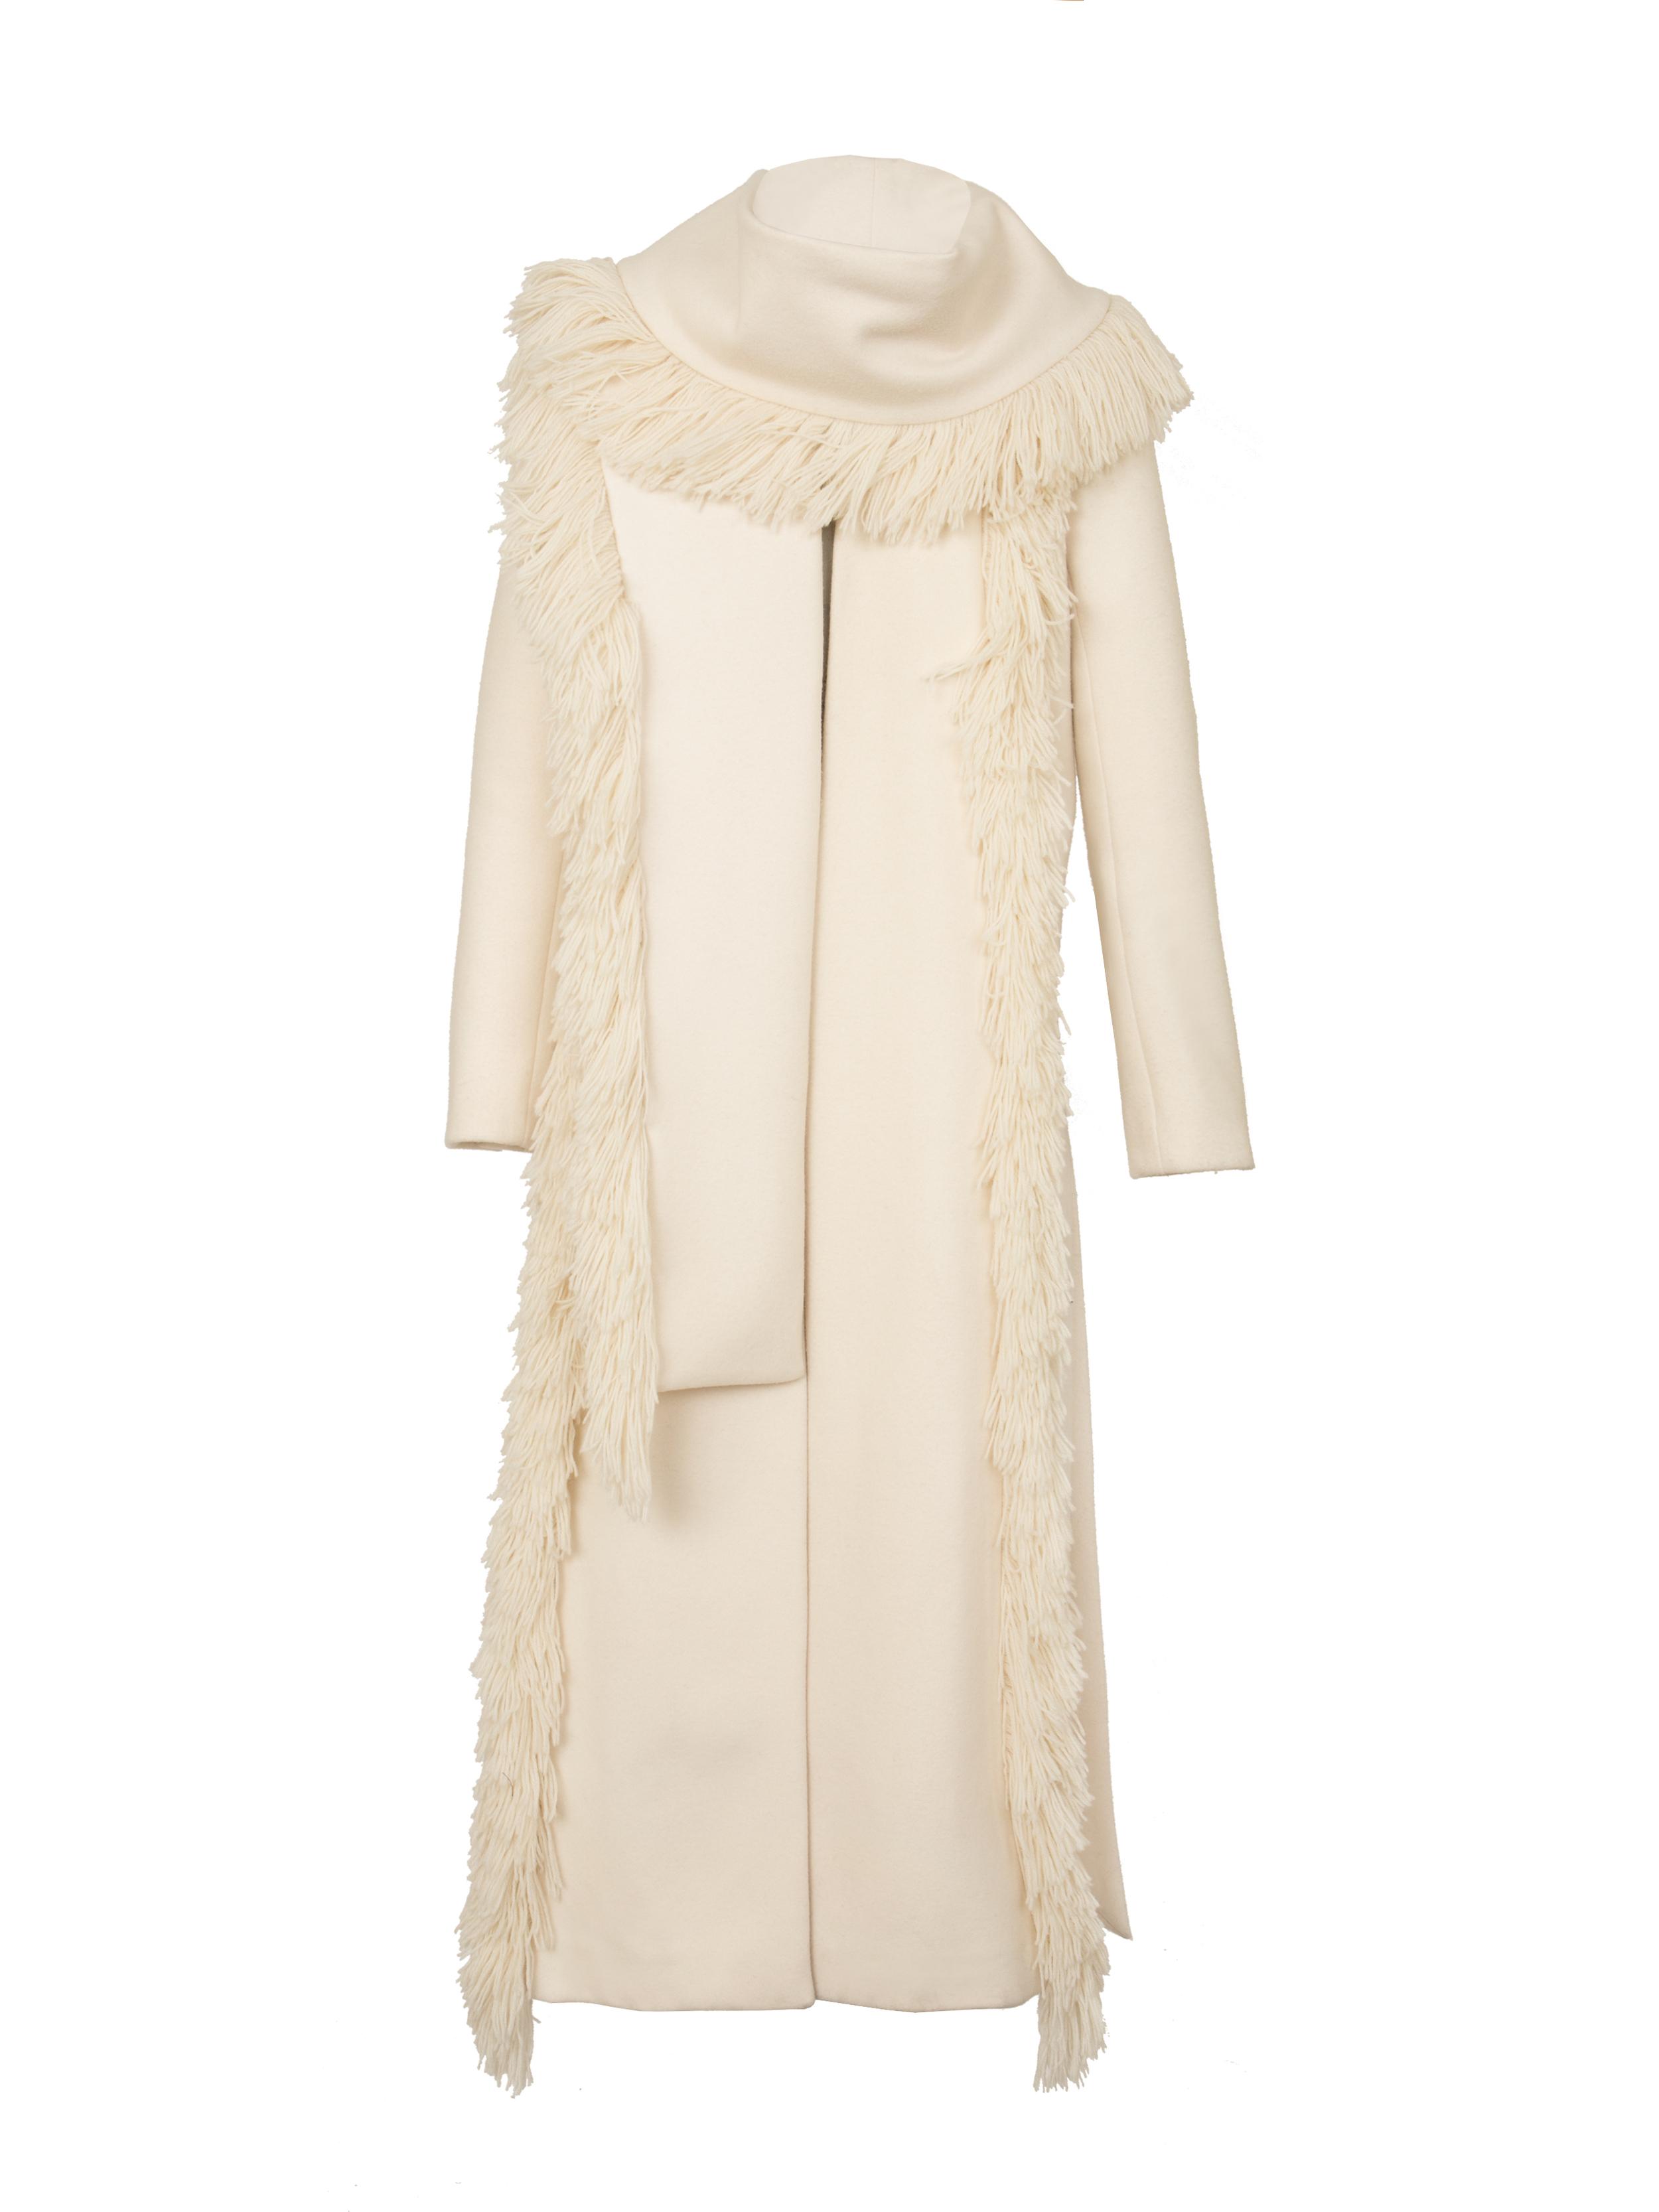 P7865-H, Wool Fringe Coat, Ivory.jpg